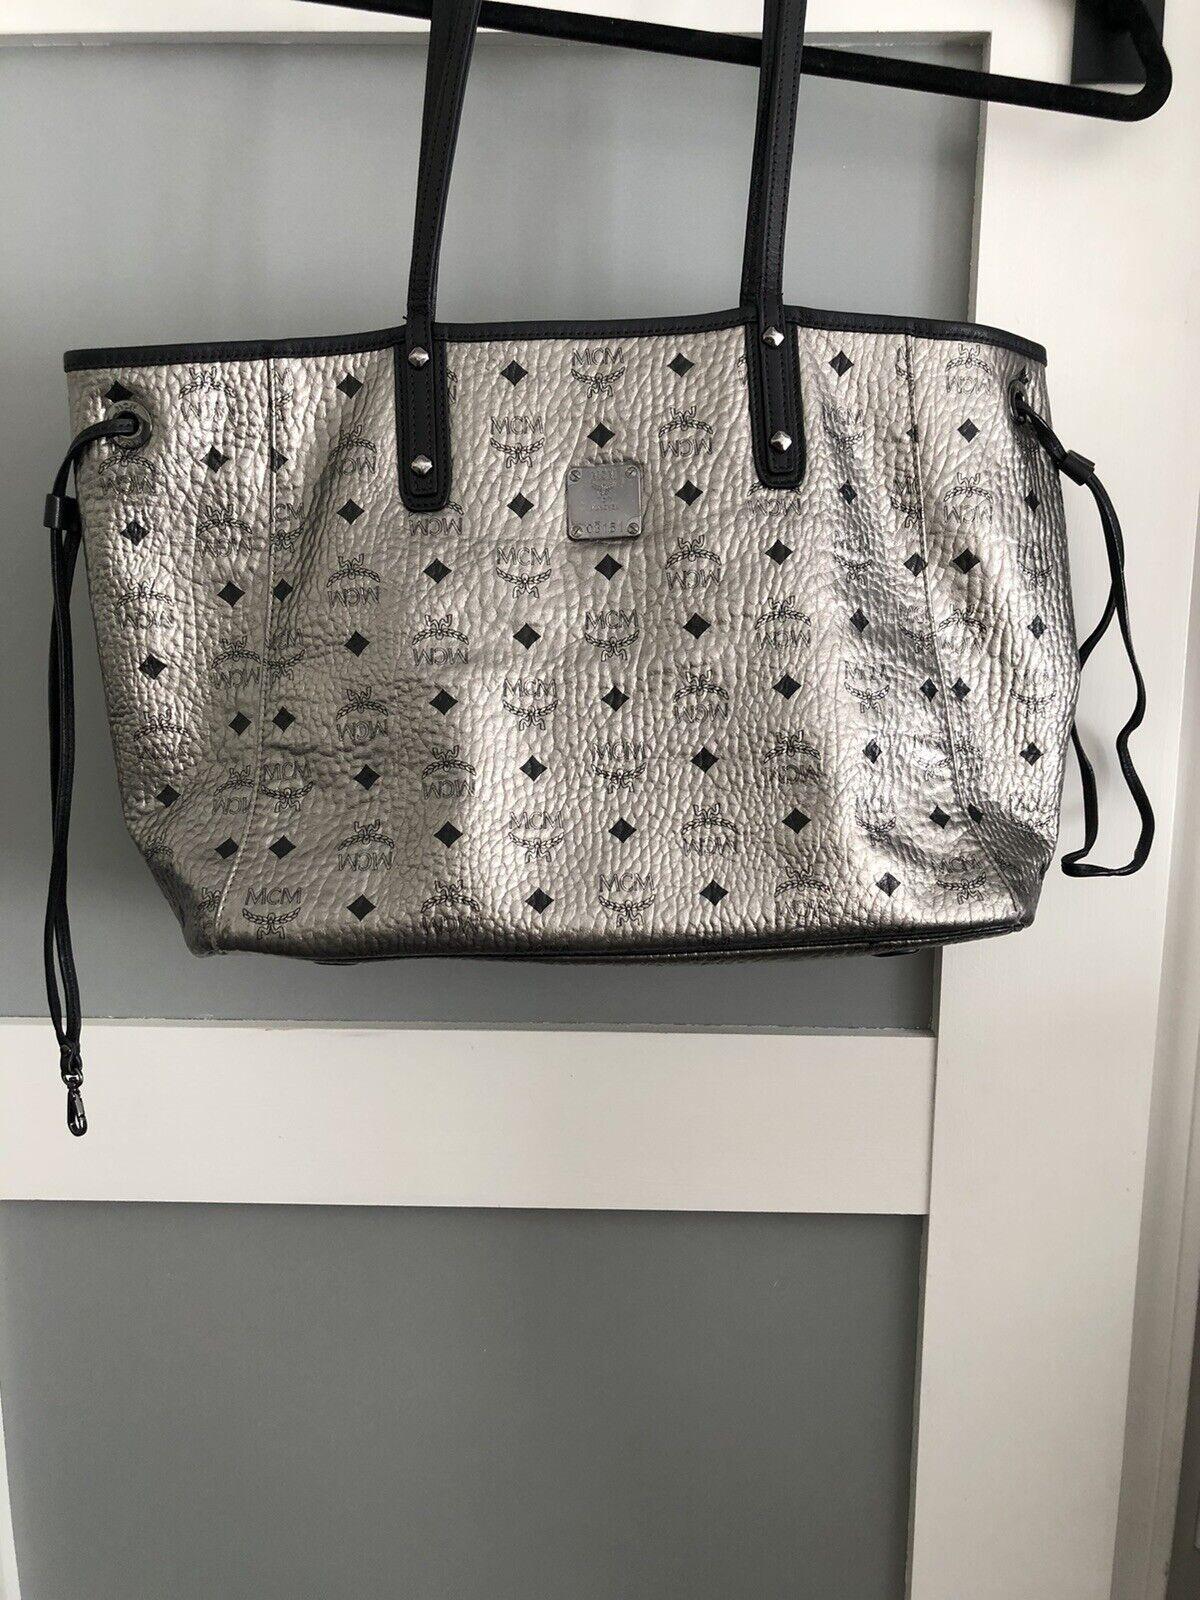 MCM Liz Reversible Shopper Handbag- Silver with Matching Pouchette